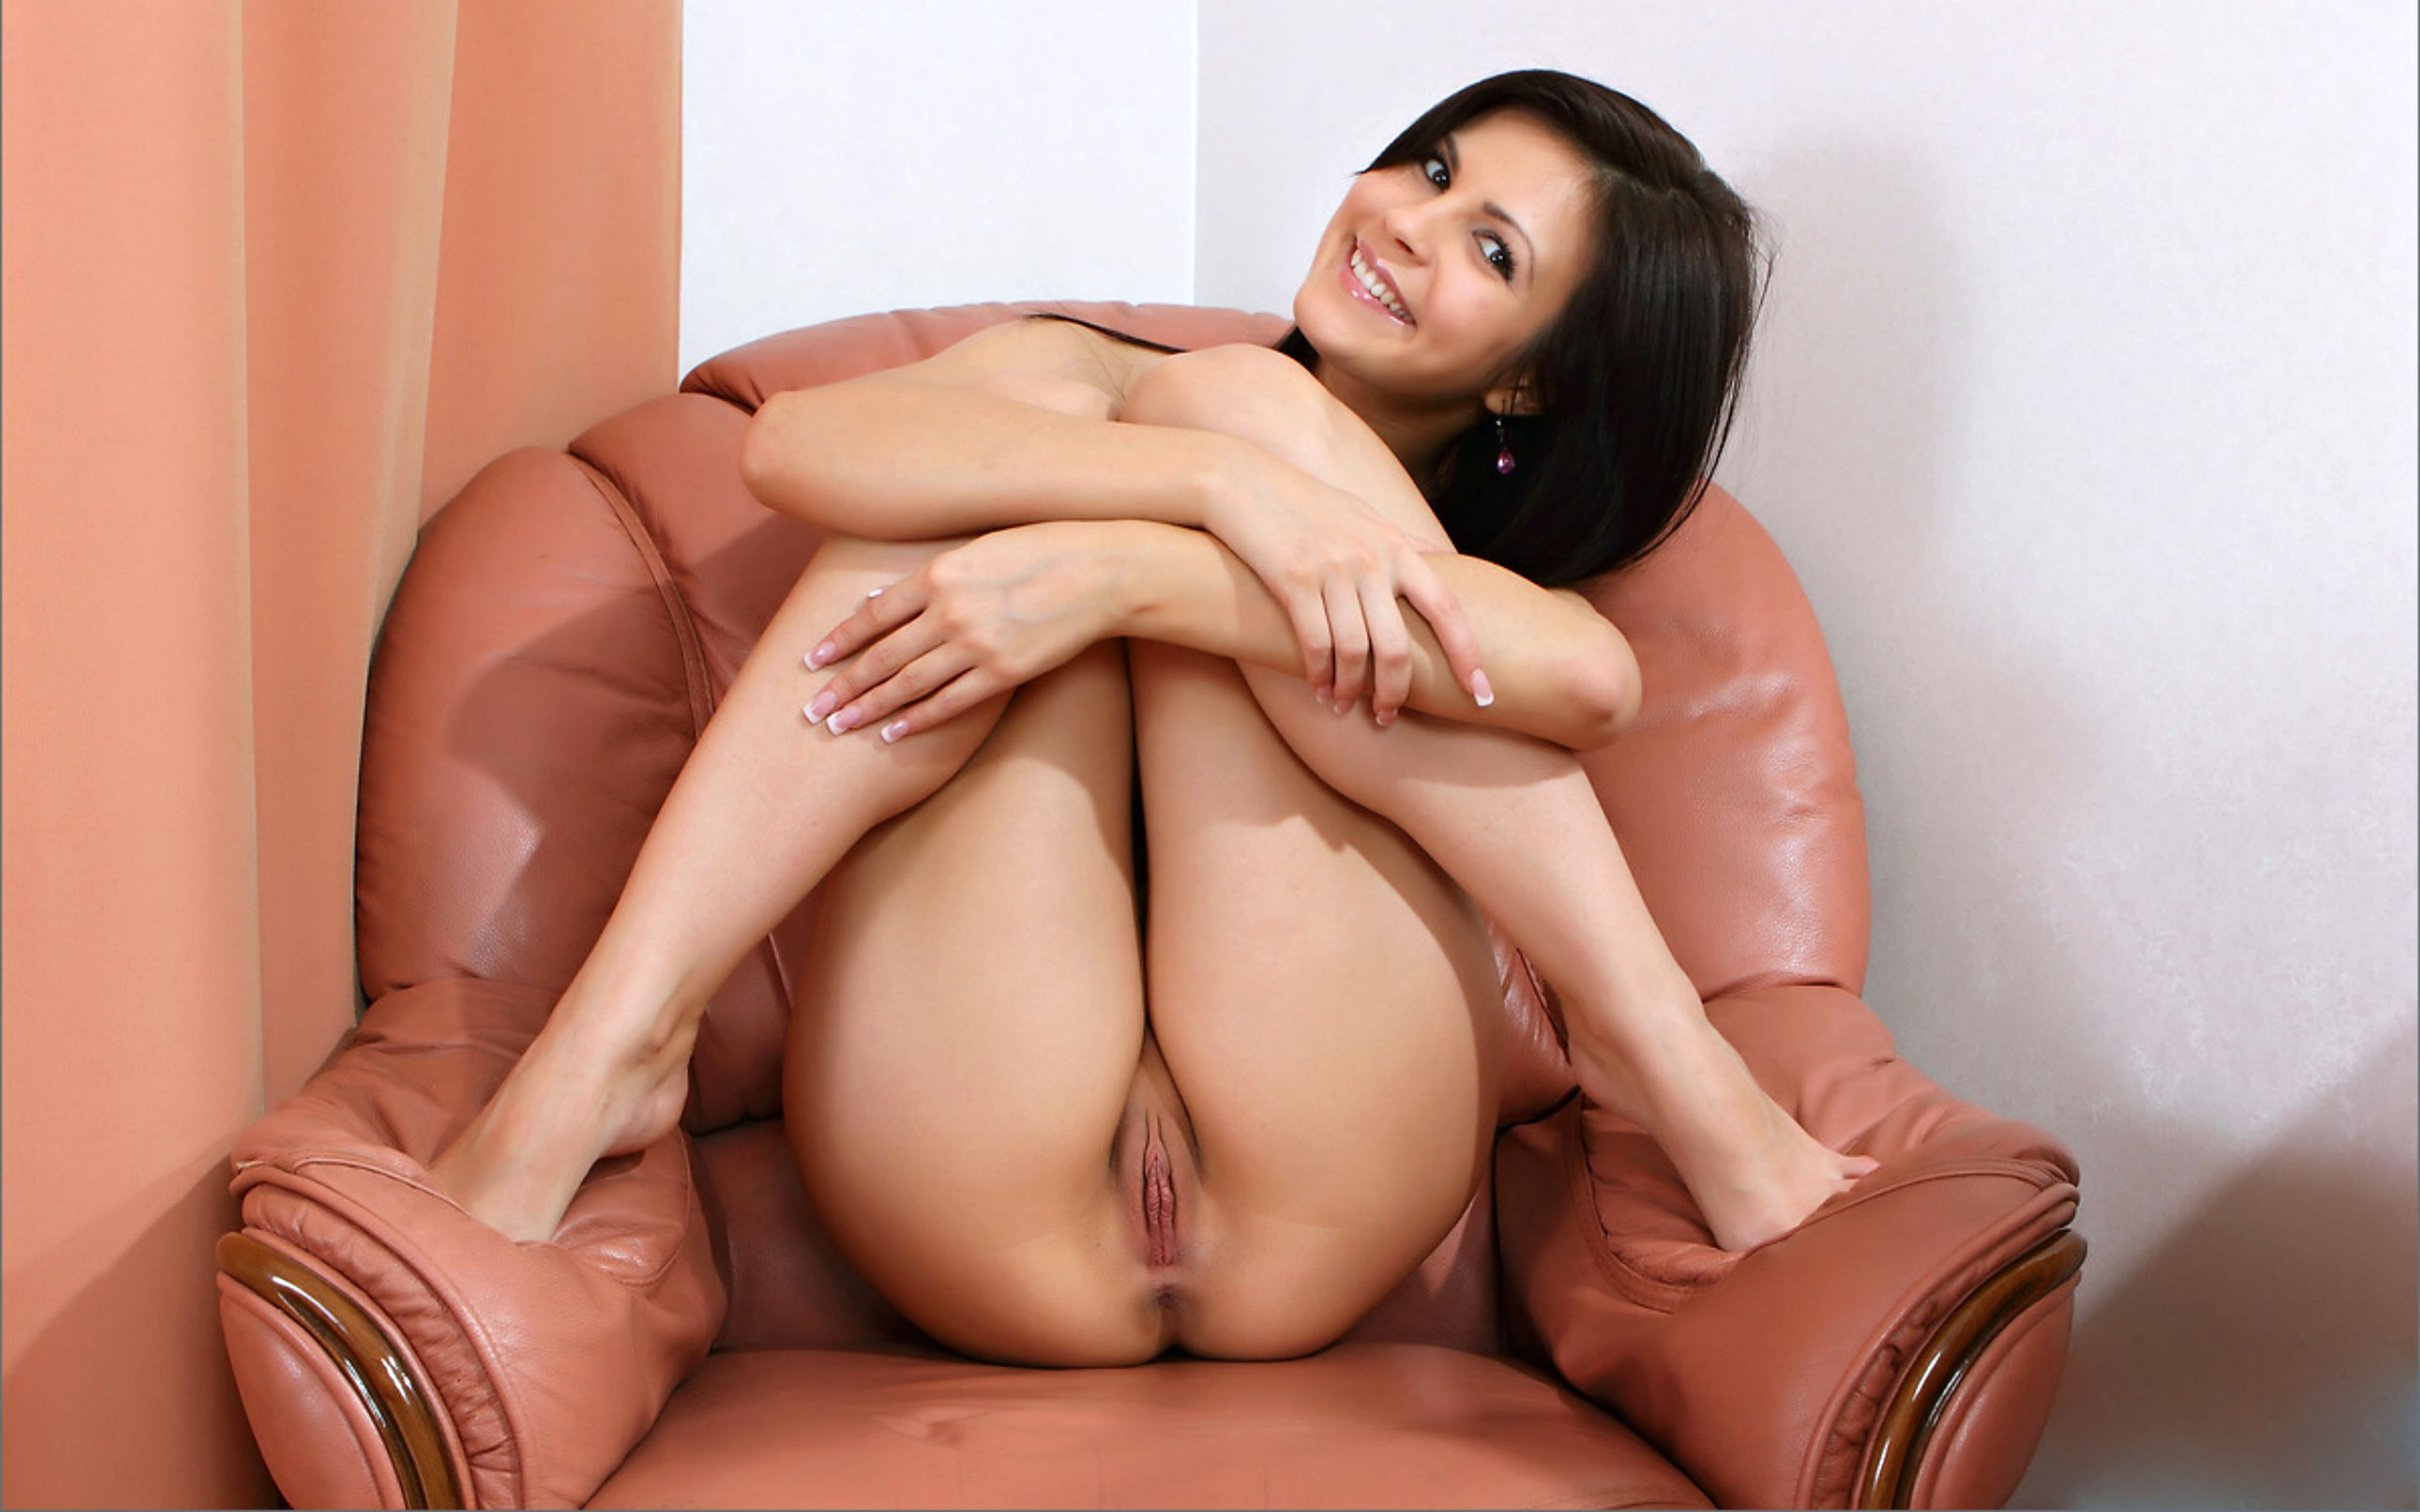 Секс в шортах порно онлайн 6 фотография